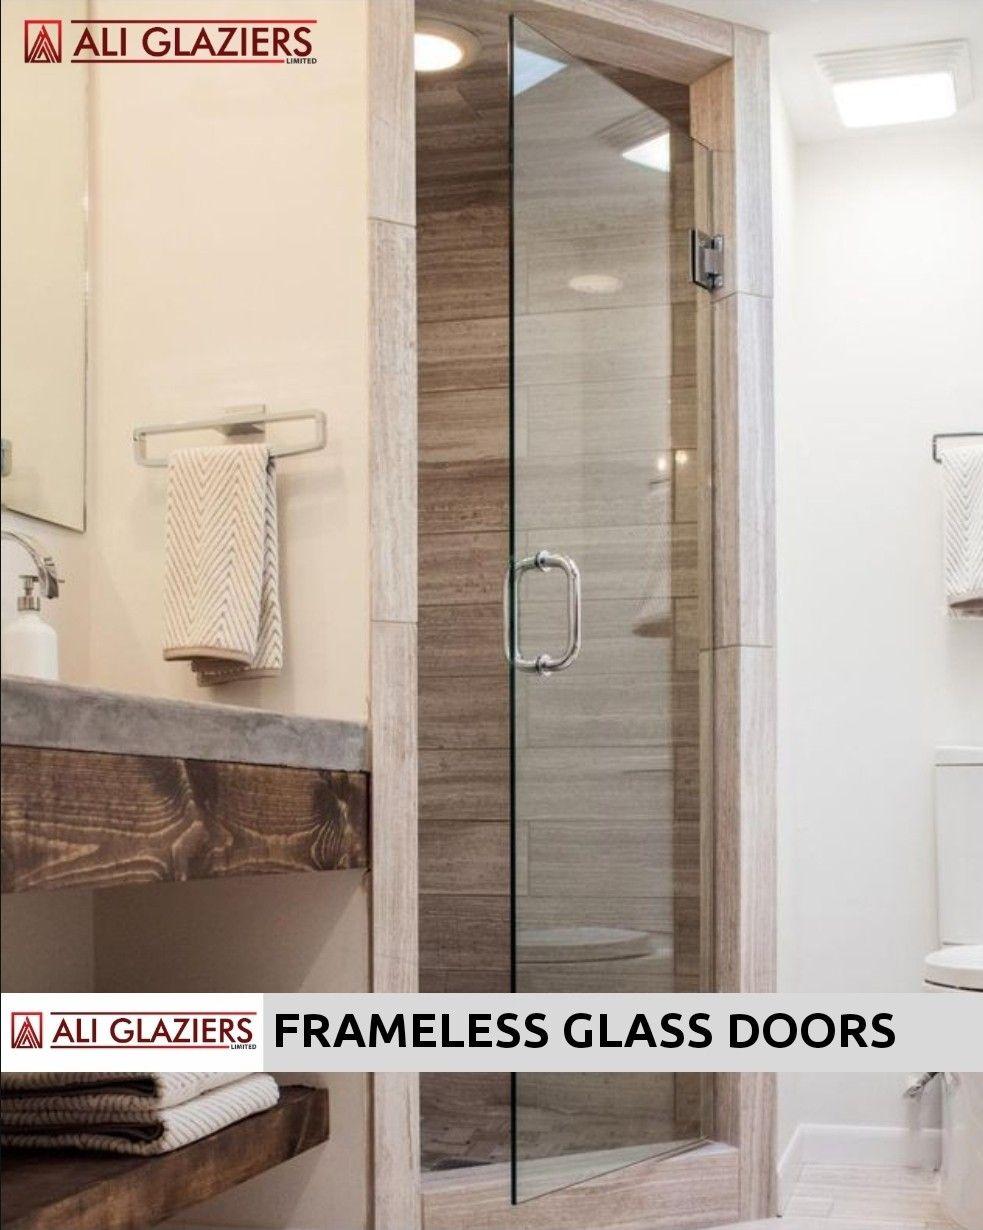 Before And After Pics Of Framed Shower Versus A Frameless Shower Door Frameless Shower Doors Complete Any B Bathroom Shower Doors Glass Shower Diy Shower Door